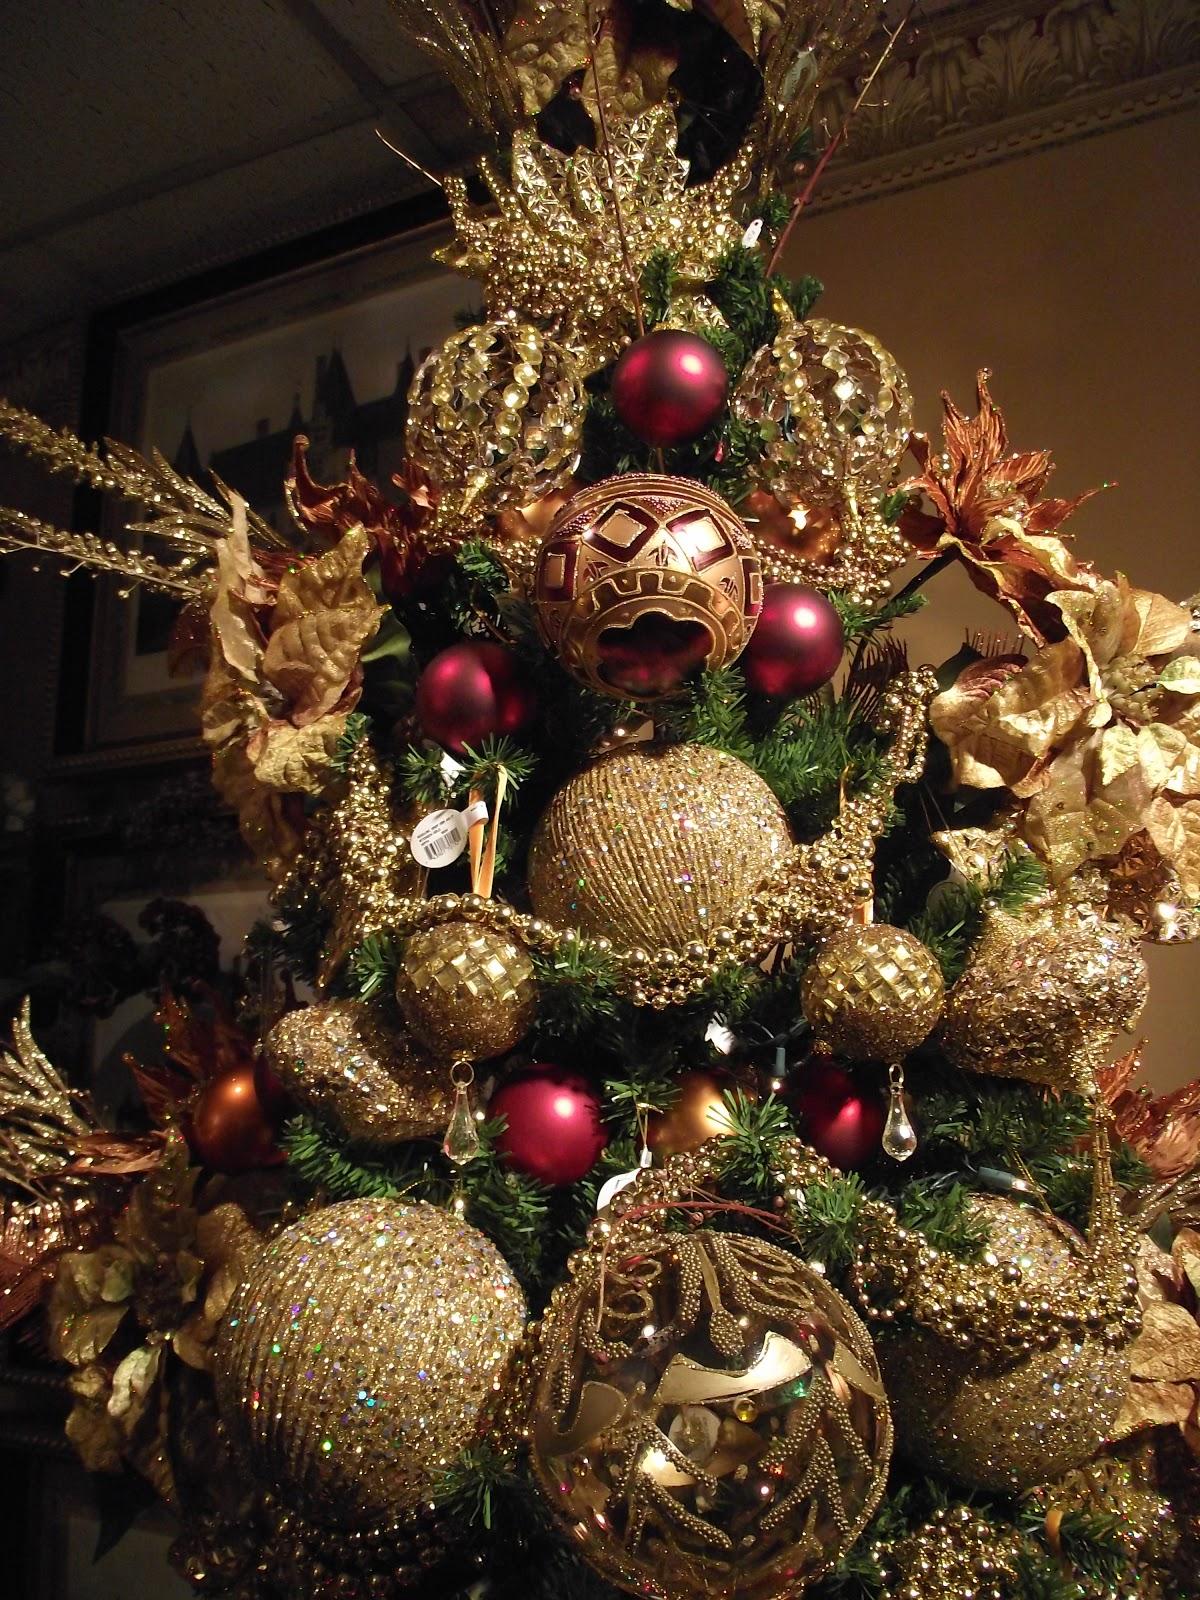 Blue christmas tree decorating ideas - Christmas Tree Decorations Gold And Red Decorating A Christmas Tree In